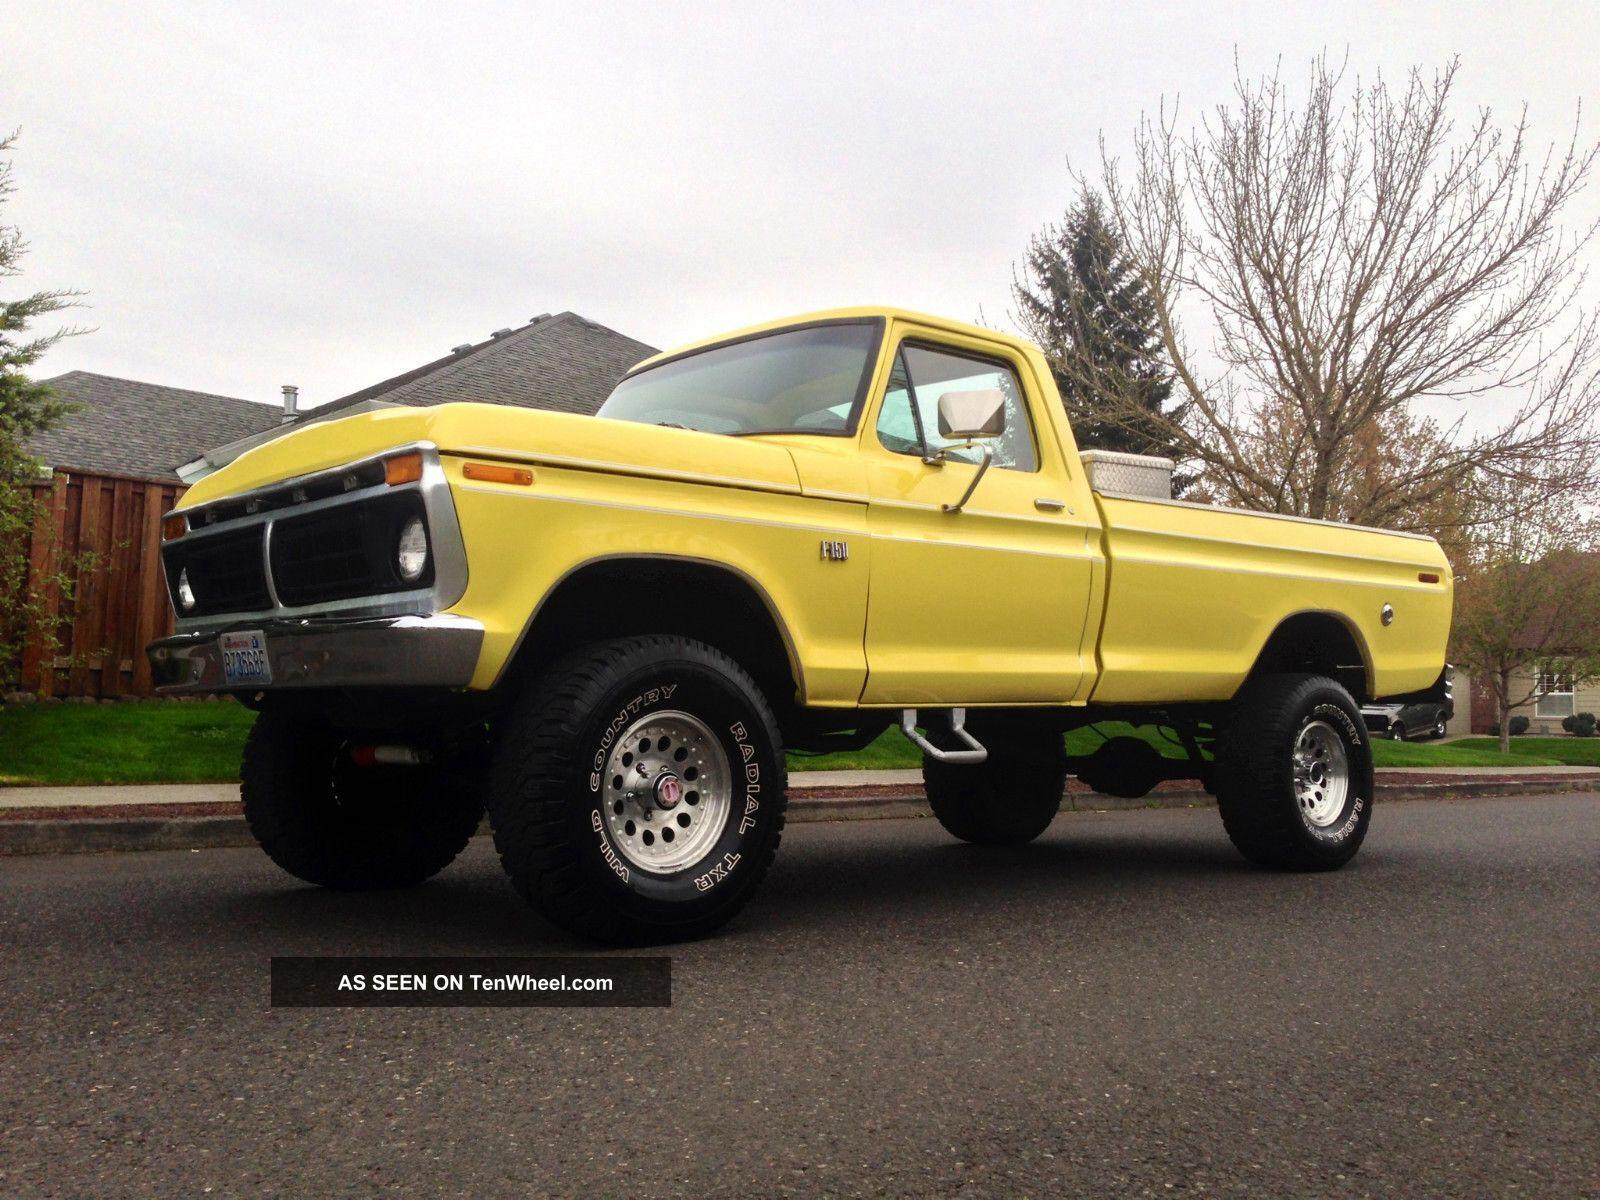 Image From Http Tenwheel Com Imgs A B A C M 1976 Ford F150 Ranger 4x4 Xlt Longbed 1977 1975 1978 1974 1 Lgw Jpg Ranger 4x4 Ford F150 79 Ford Truck